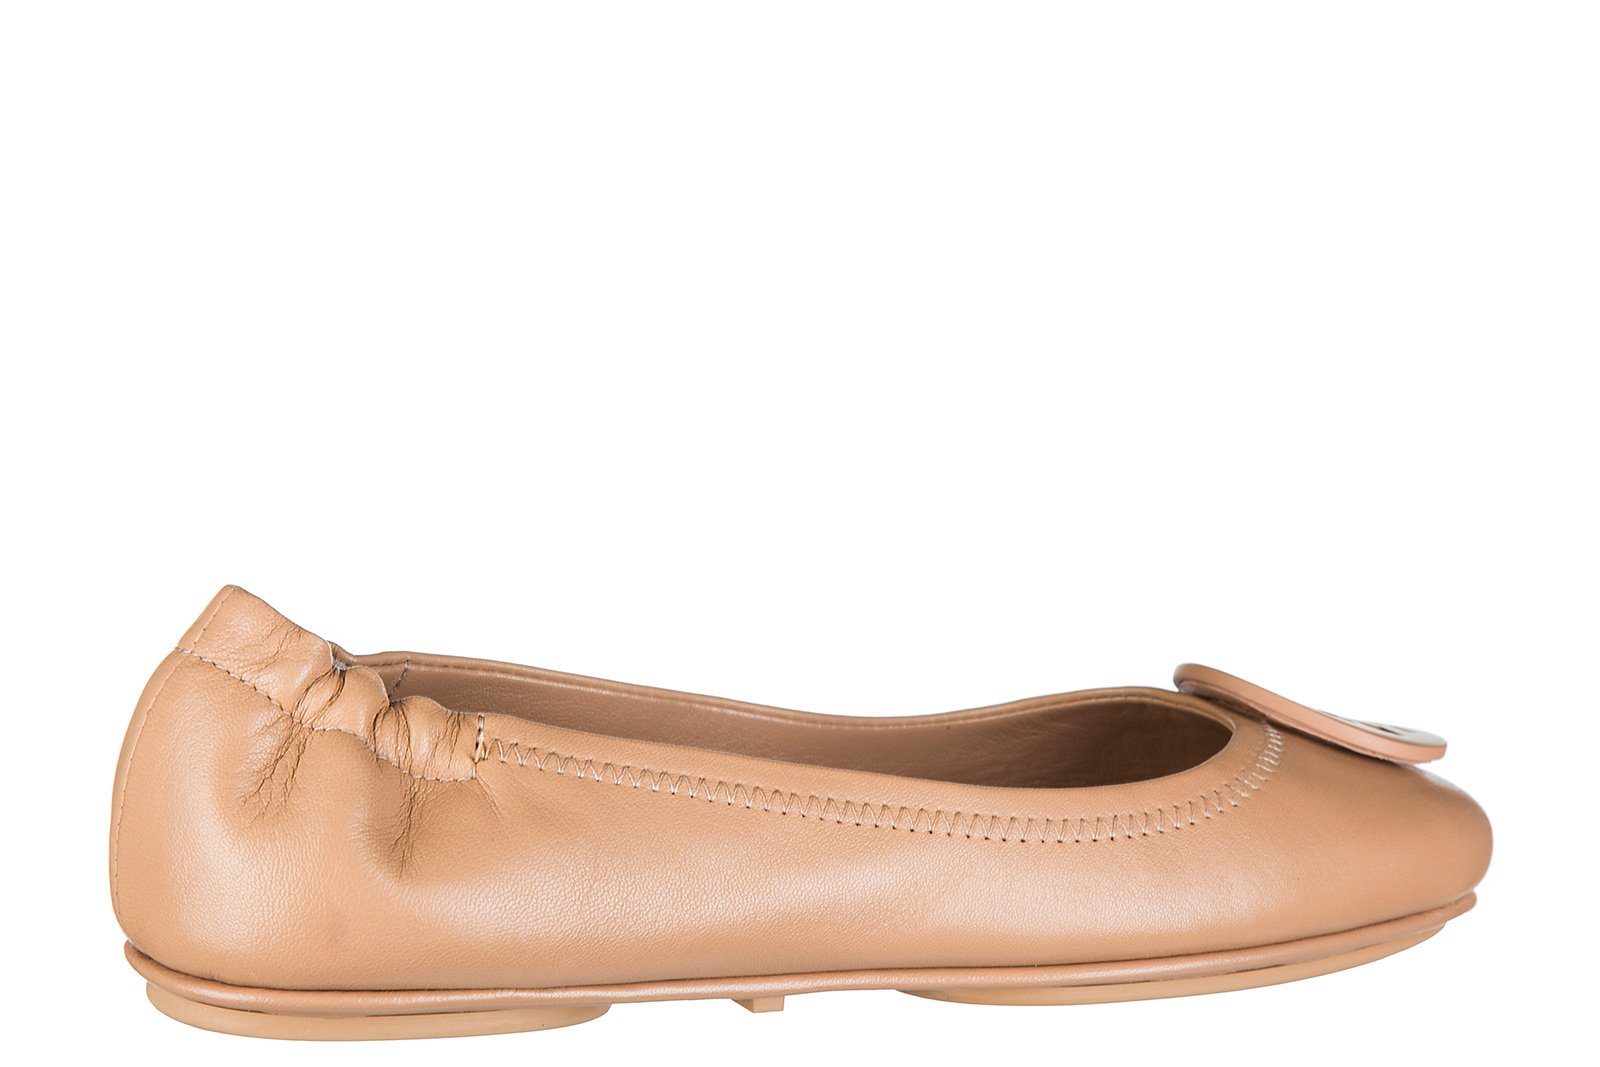 Tory Burch Women's Leather Ballet Flats Ballerinas Minnie Brown US Size 7.5 51158251254 image https://media.buyr.com/yFlfHexwLYGqNP6QWtlKqw-wi5FZgQrSX-AkDdpEYYaMg.jpg1